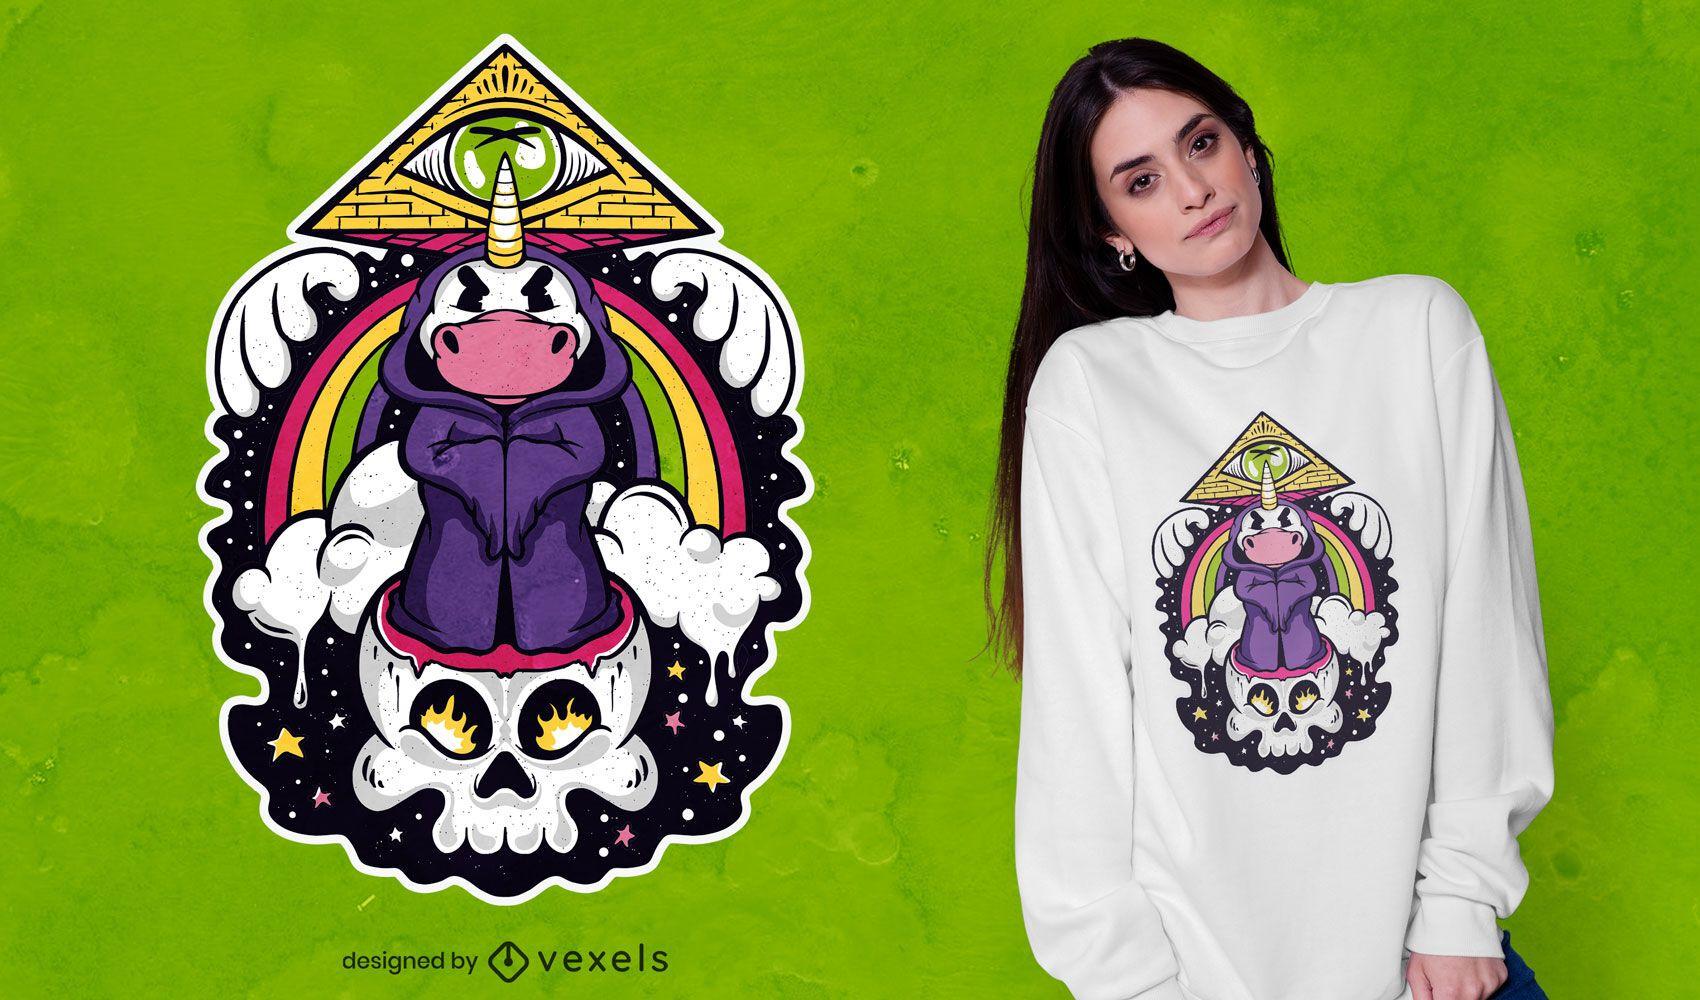 Diseño de camiseta de dibujos animados unicornio illuminati